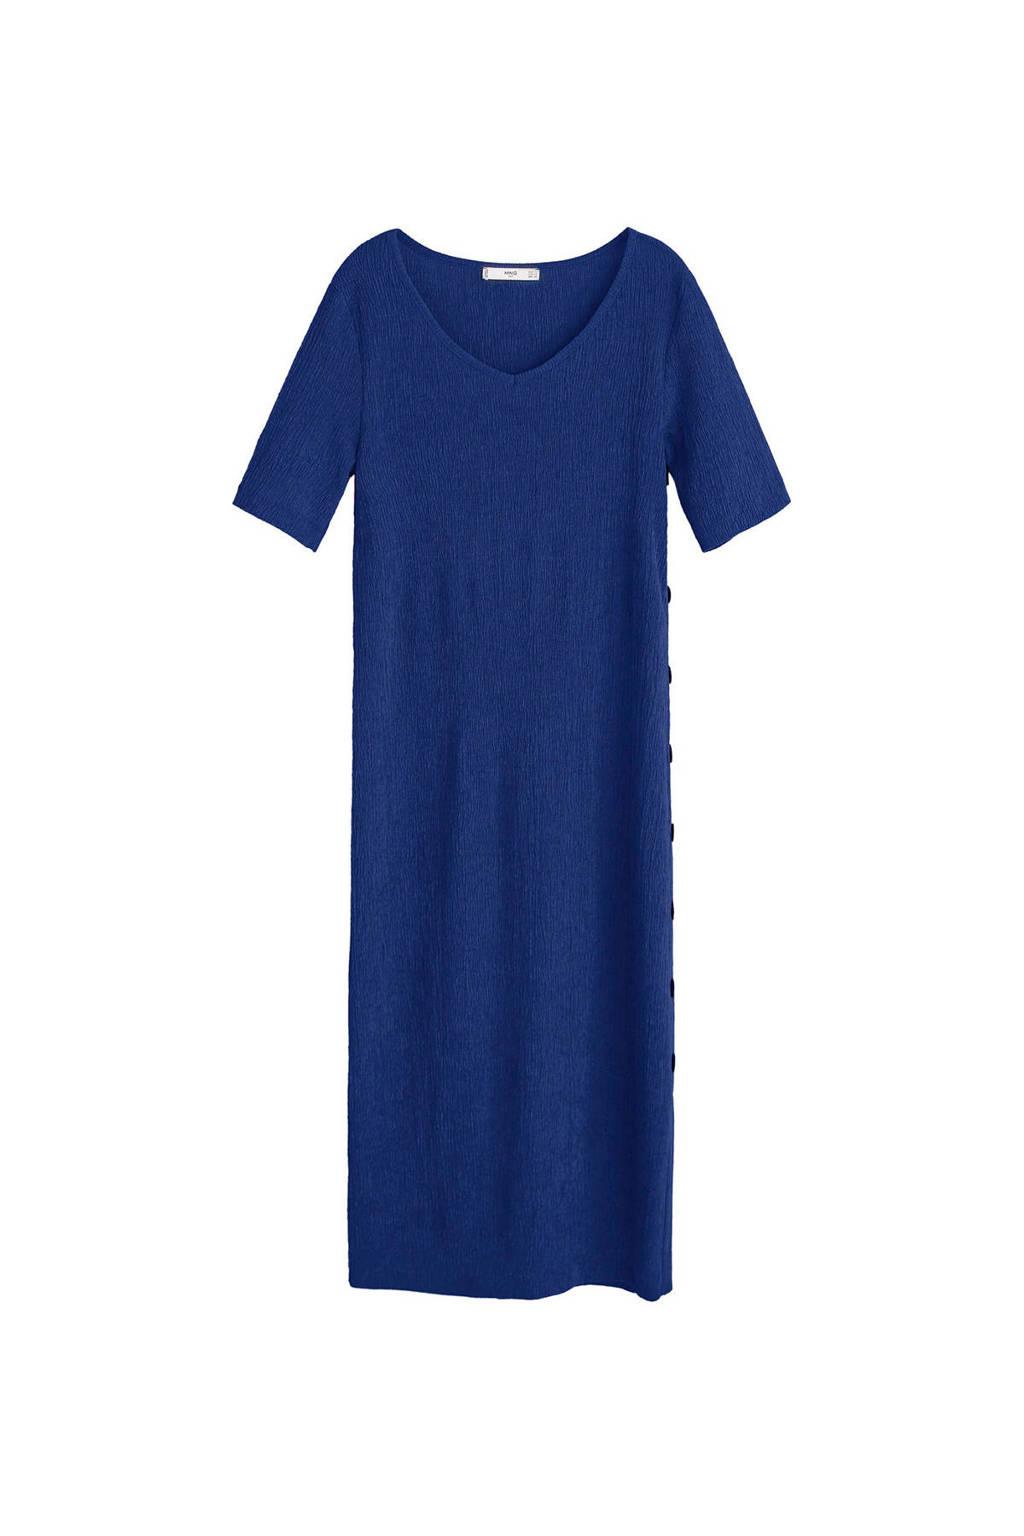 Mango jurk blauw, Blauw